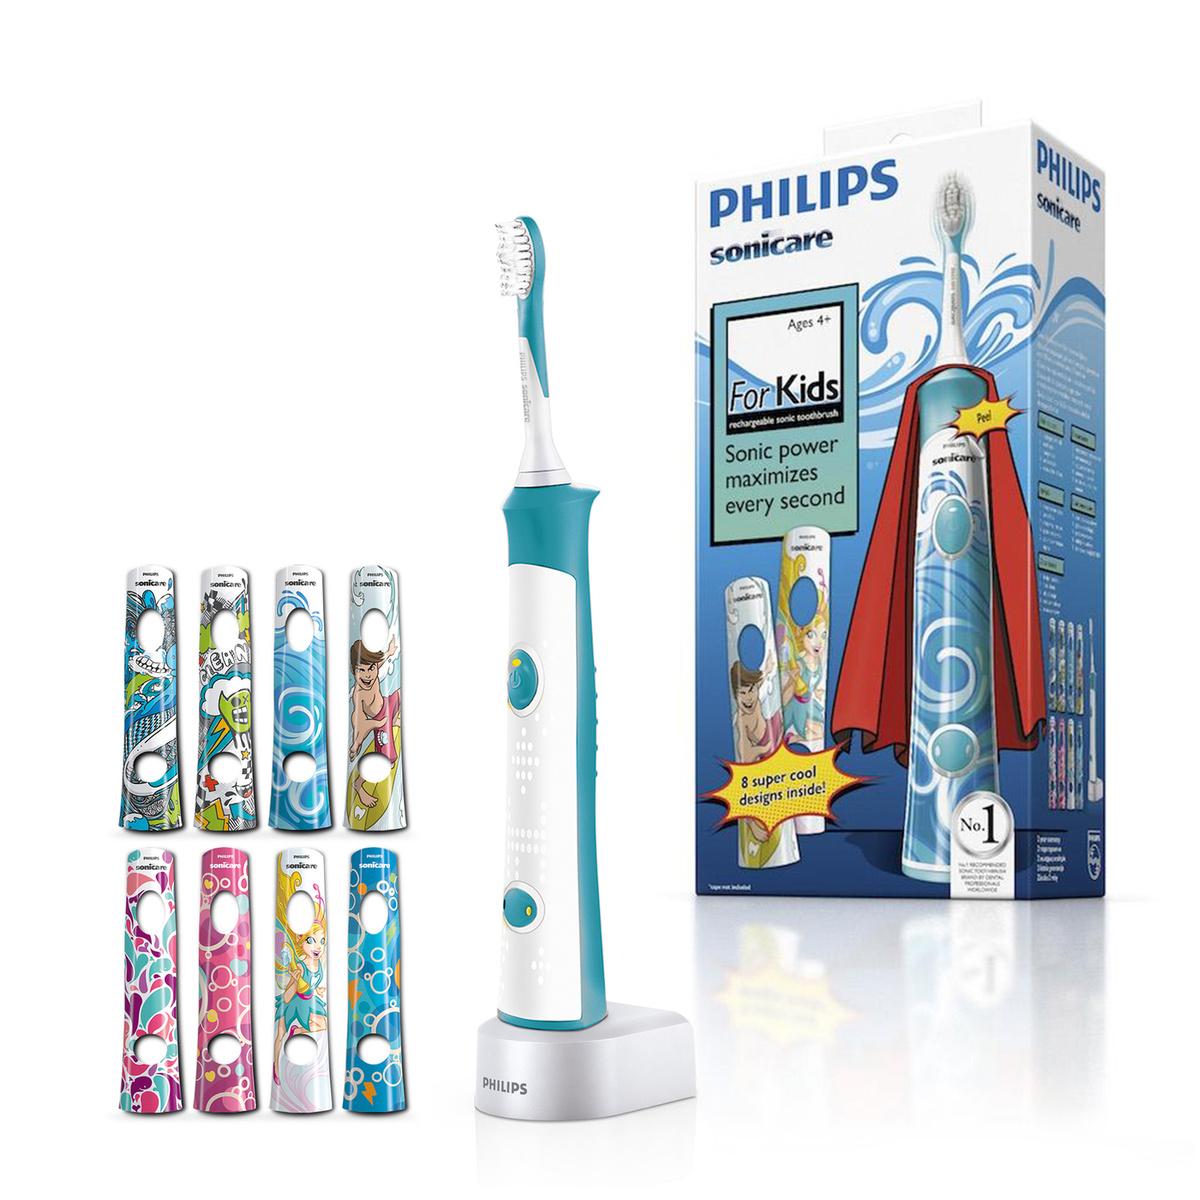 Sonicare For Kids HX6311/07 Philips